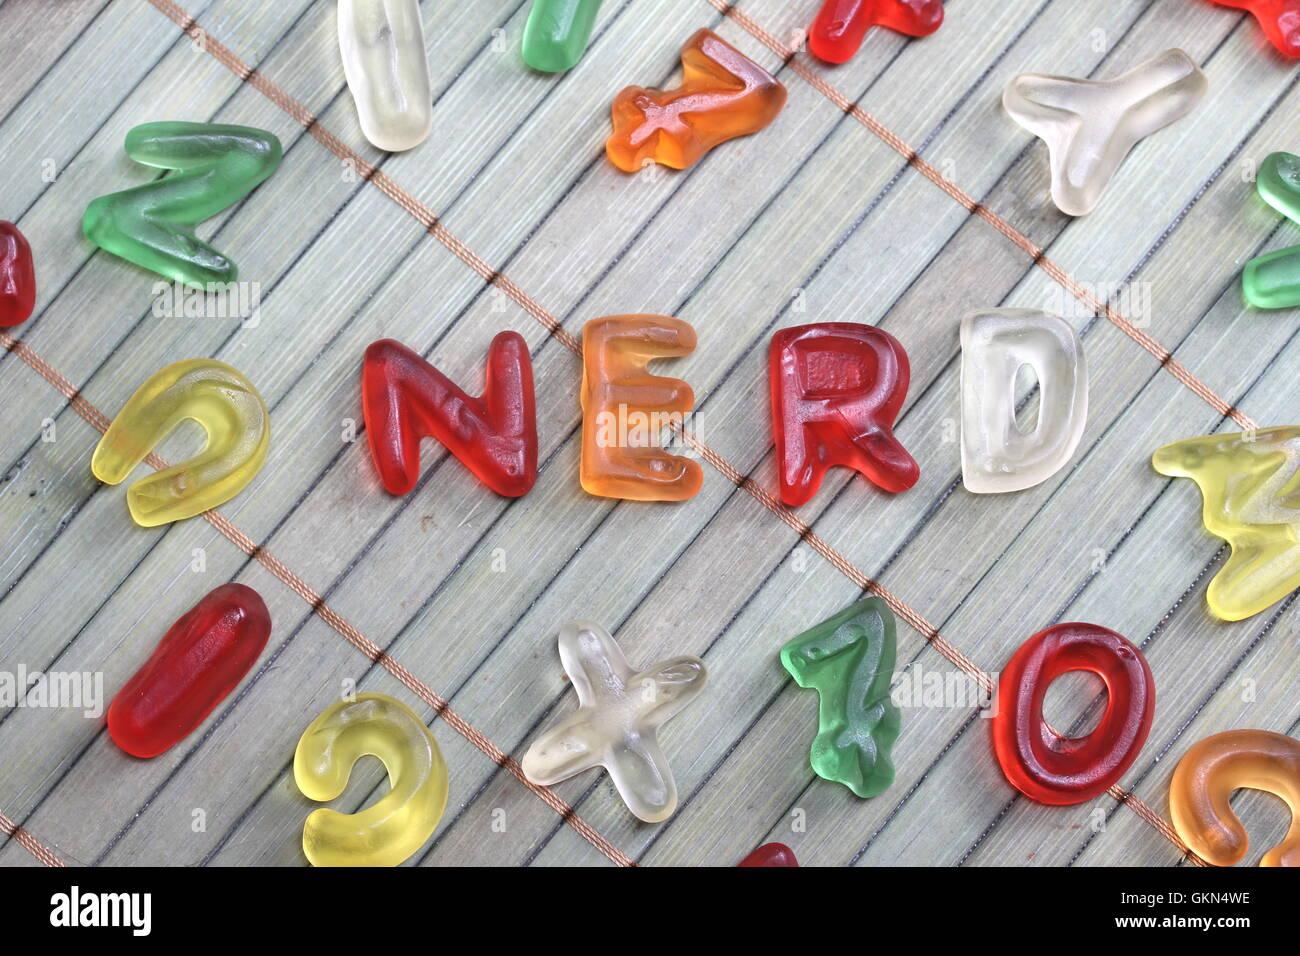 sweet letters nerd Stock Photo: 115405514 - Alamy